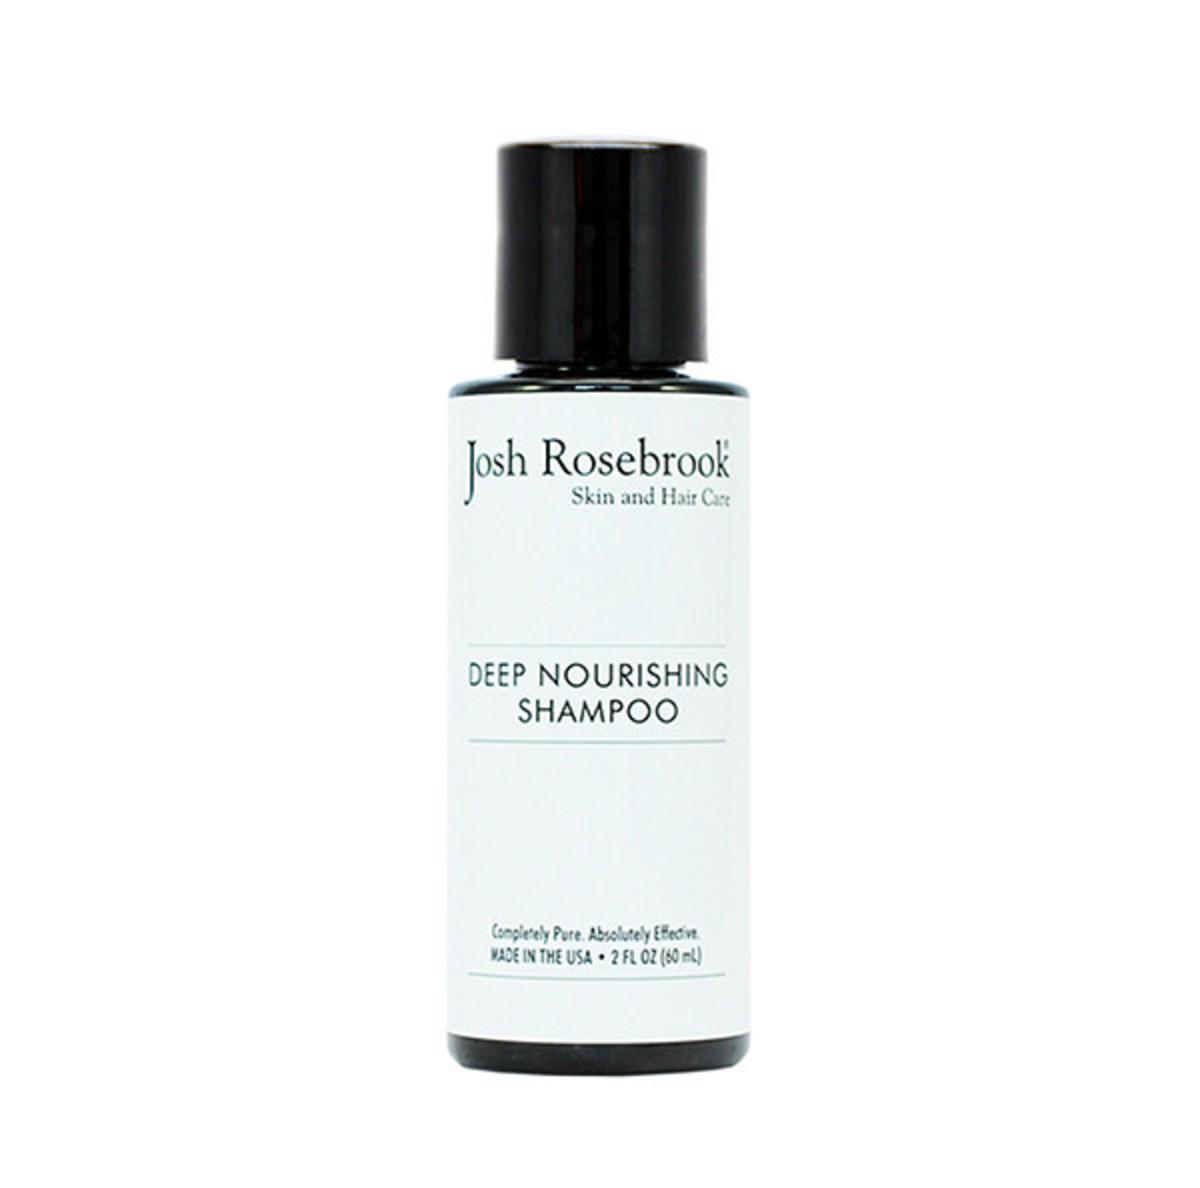 Josh Rosebrook Nourish Shampoo